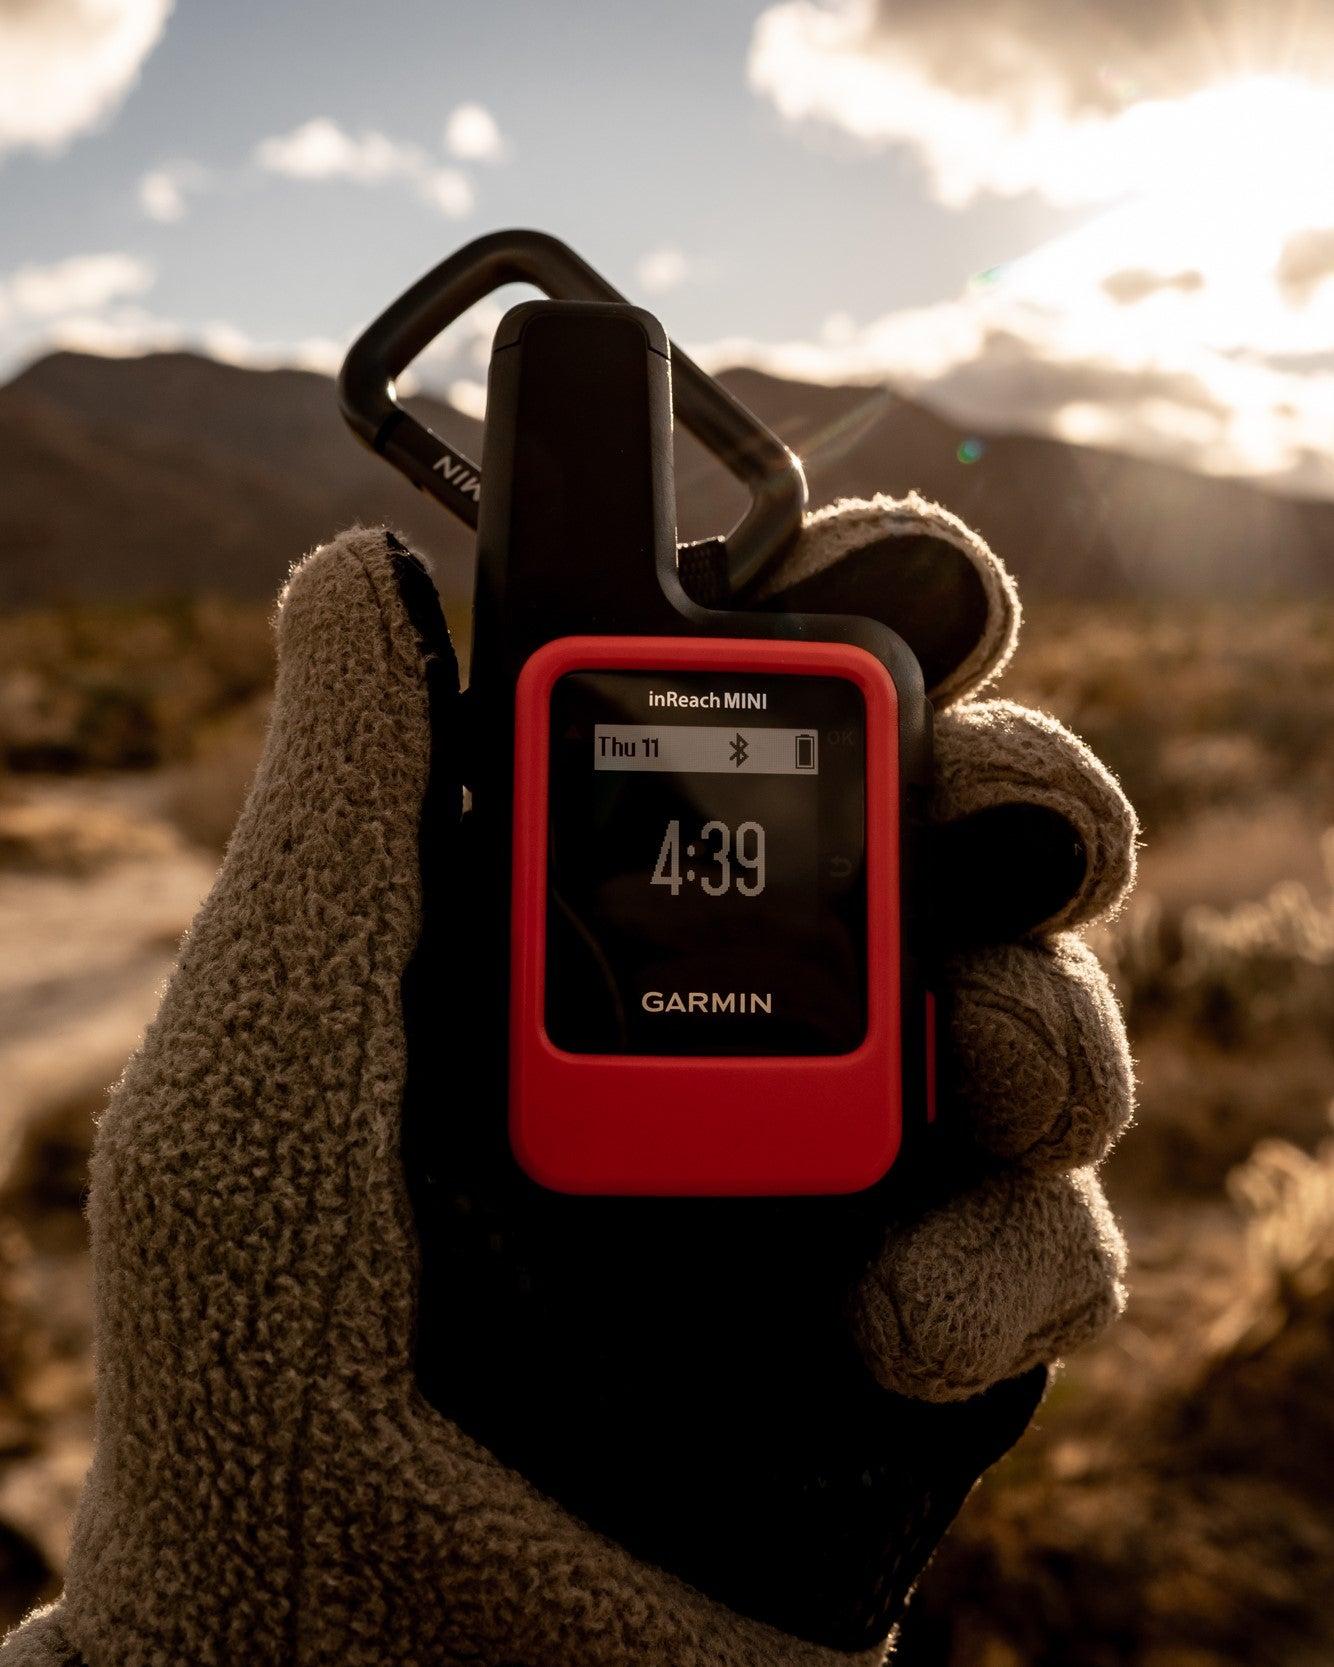 Garmin InReach Mini best gps that's handheld